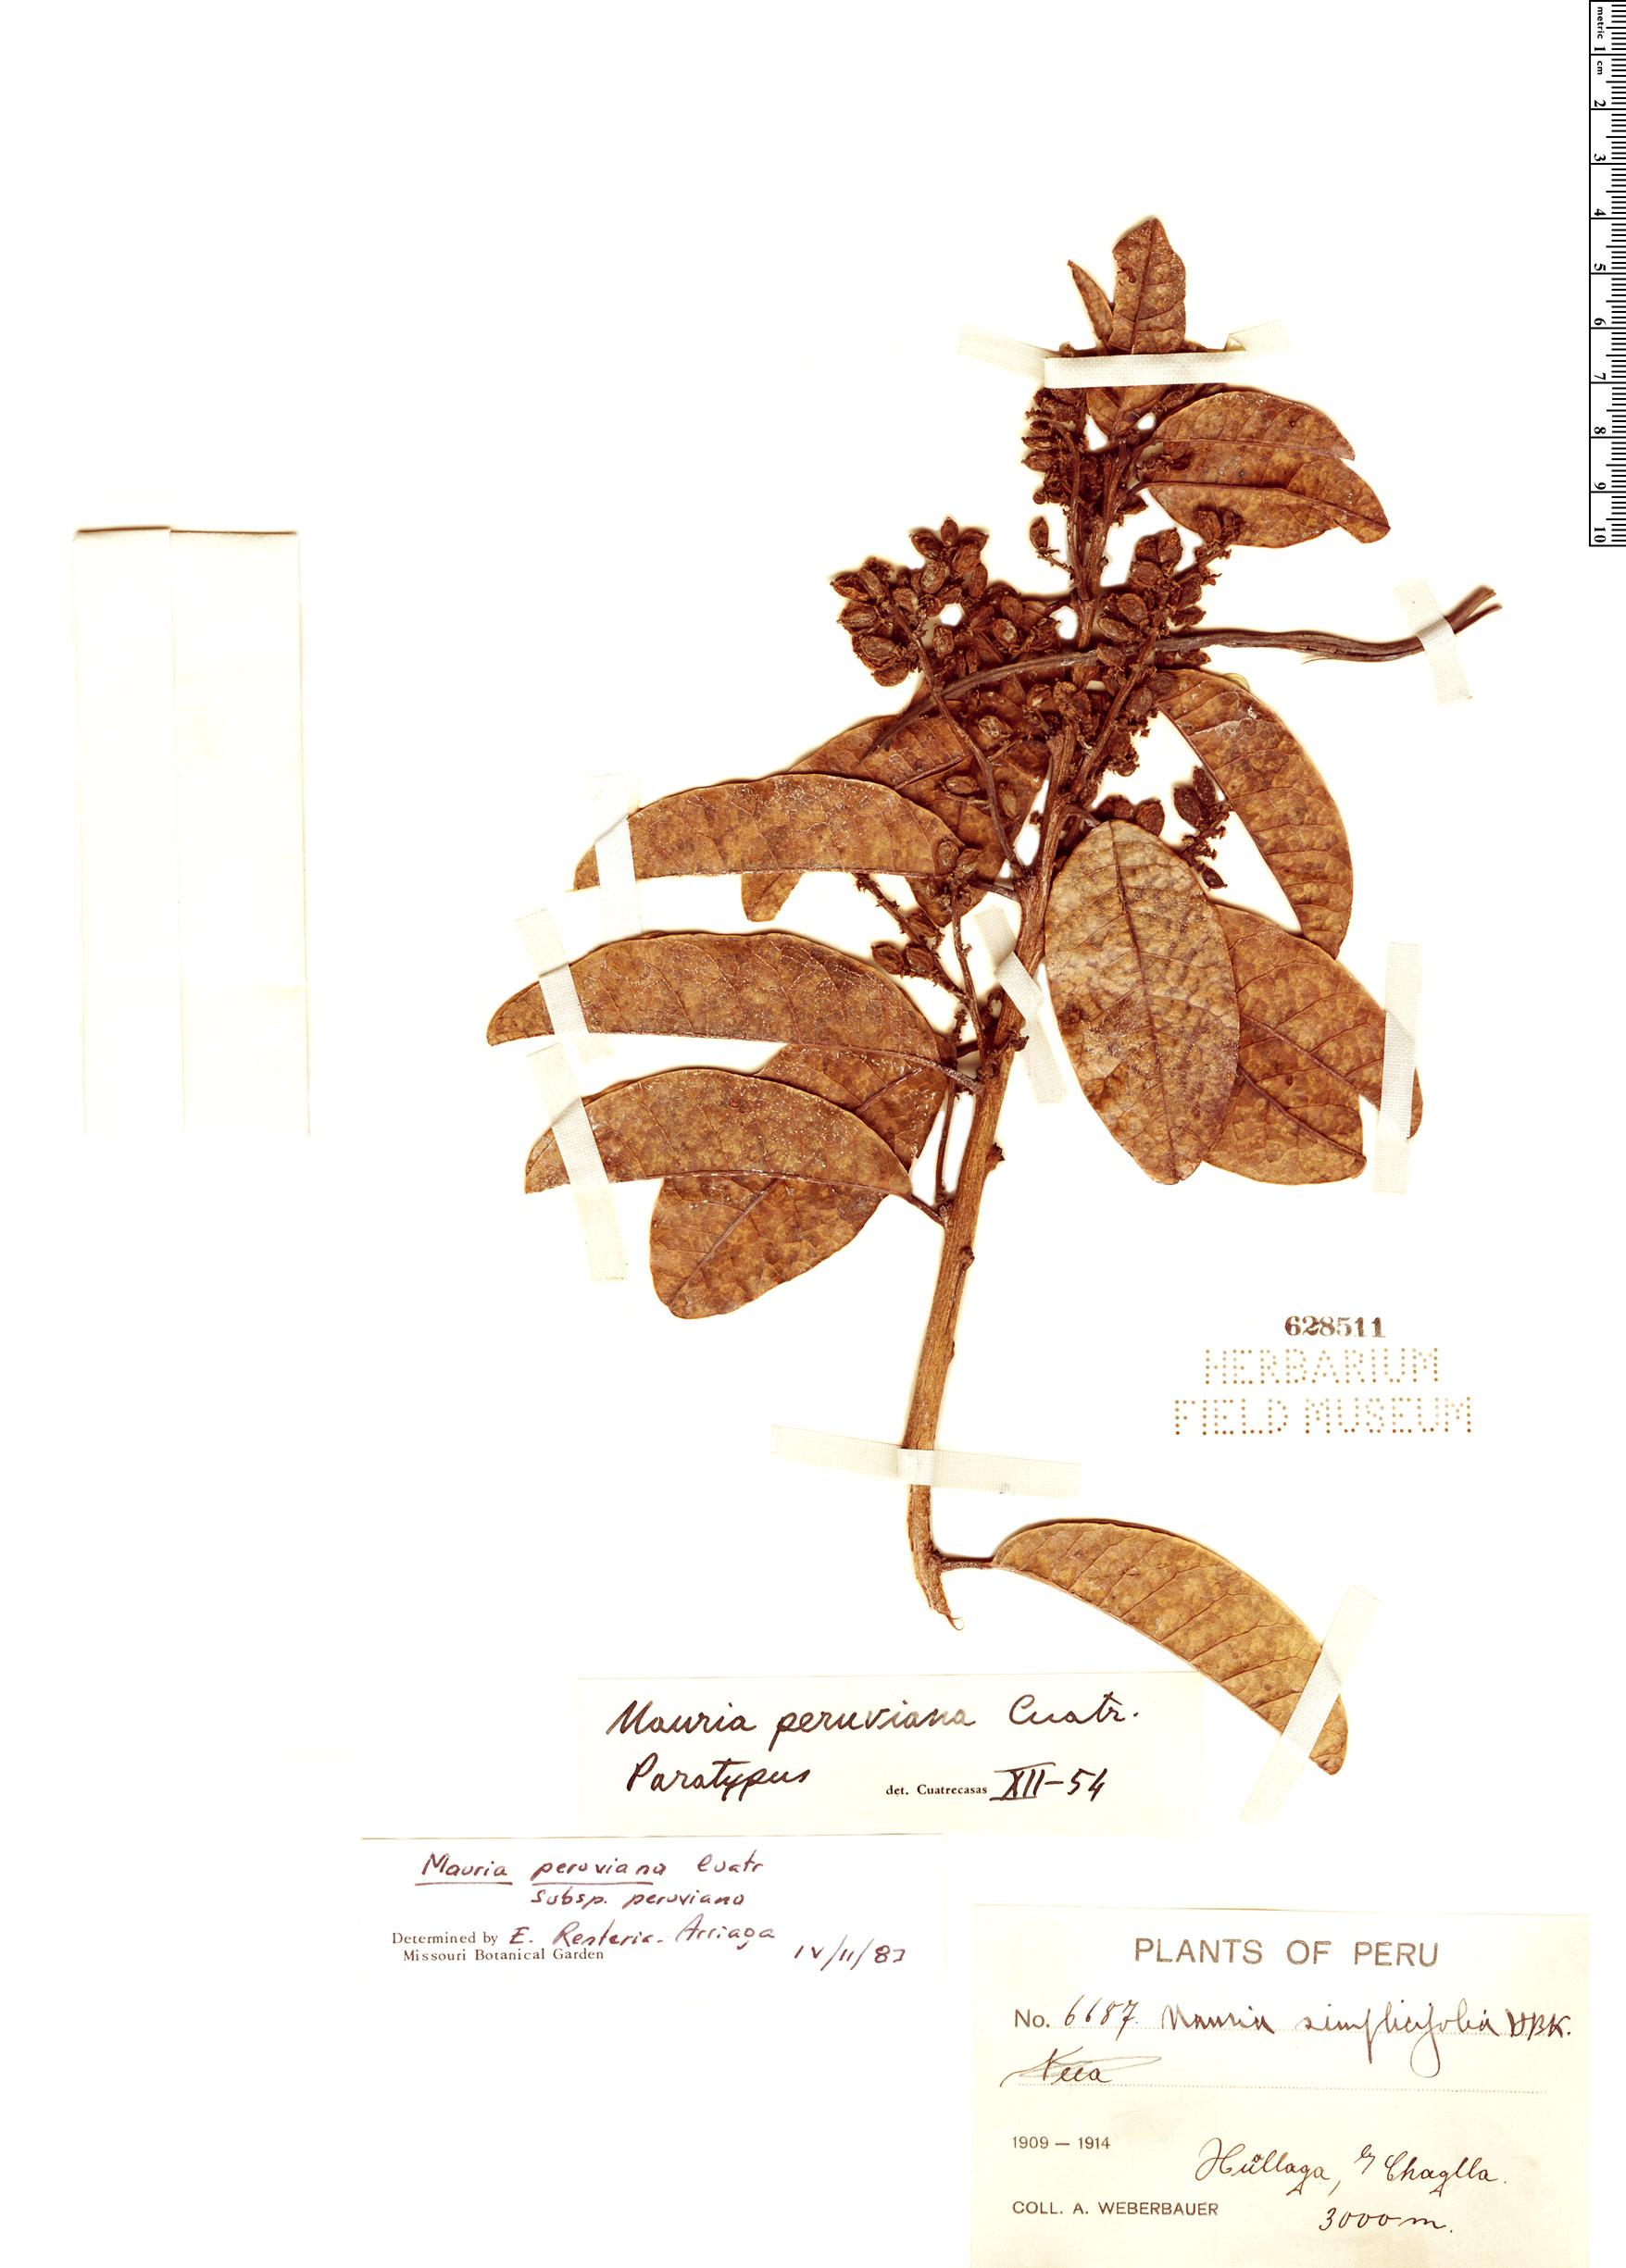 Specimen: Mauria peruviana